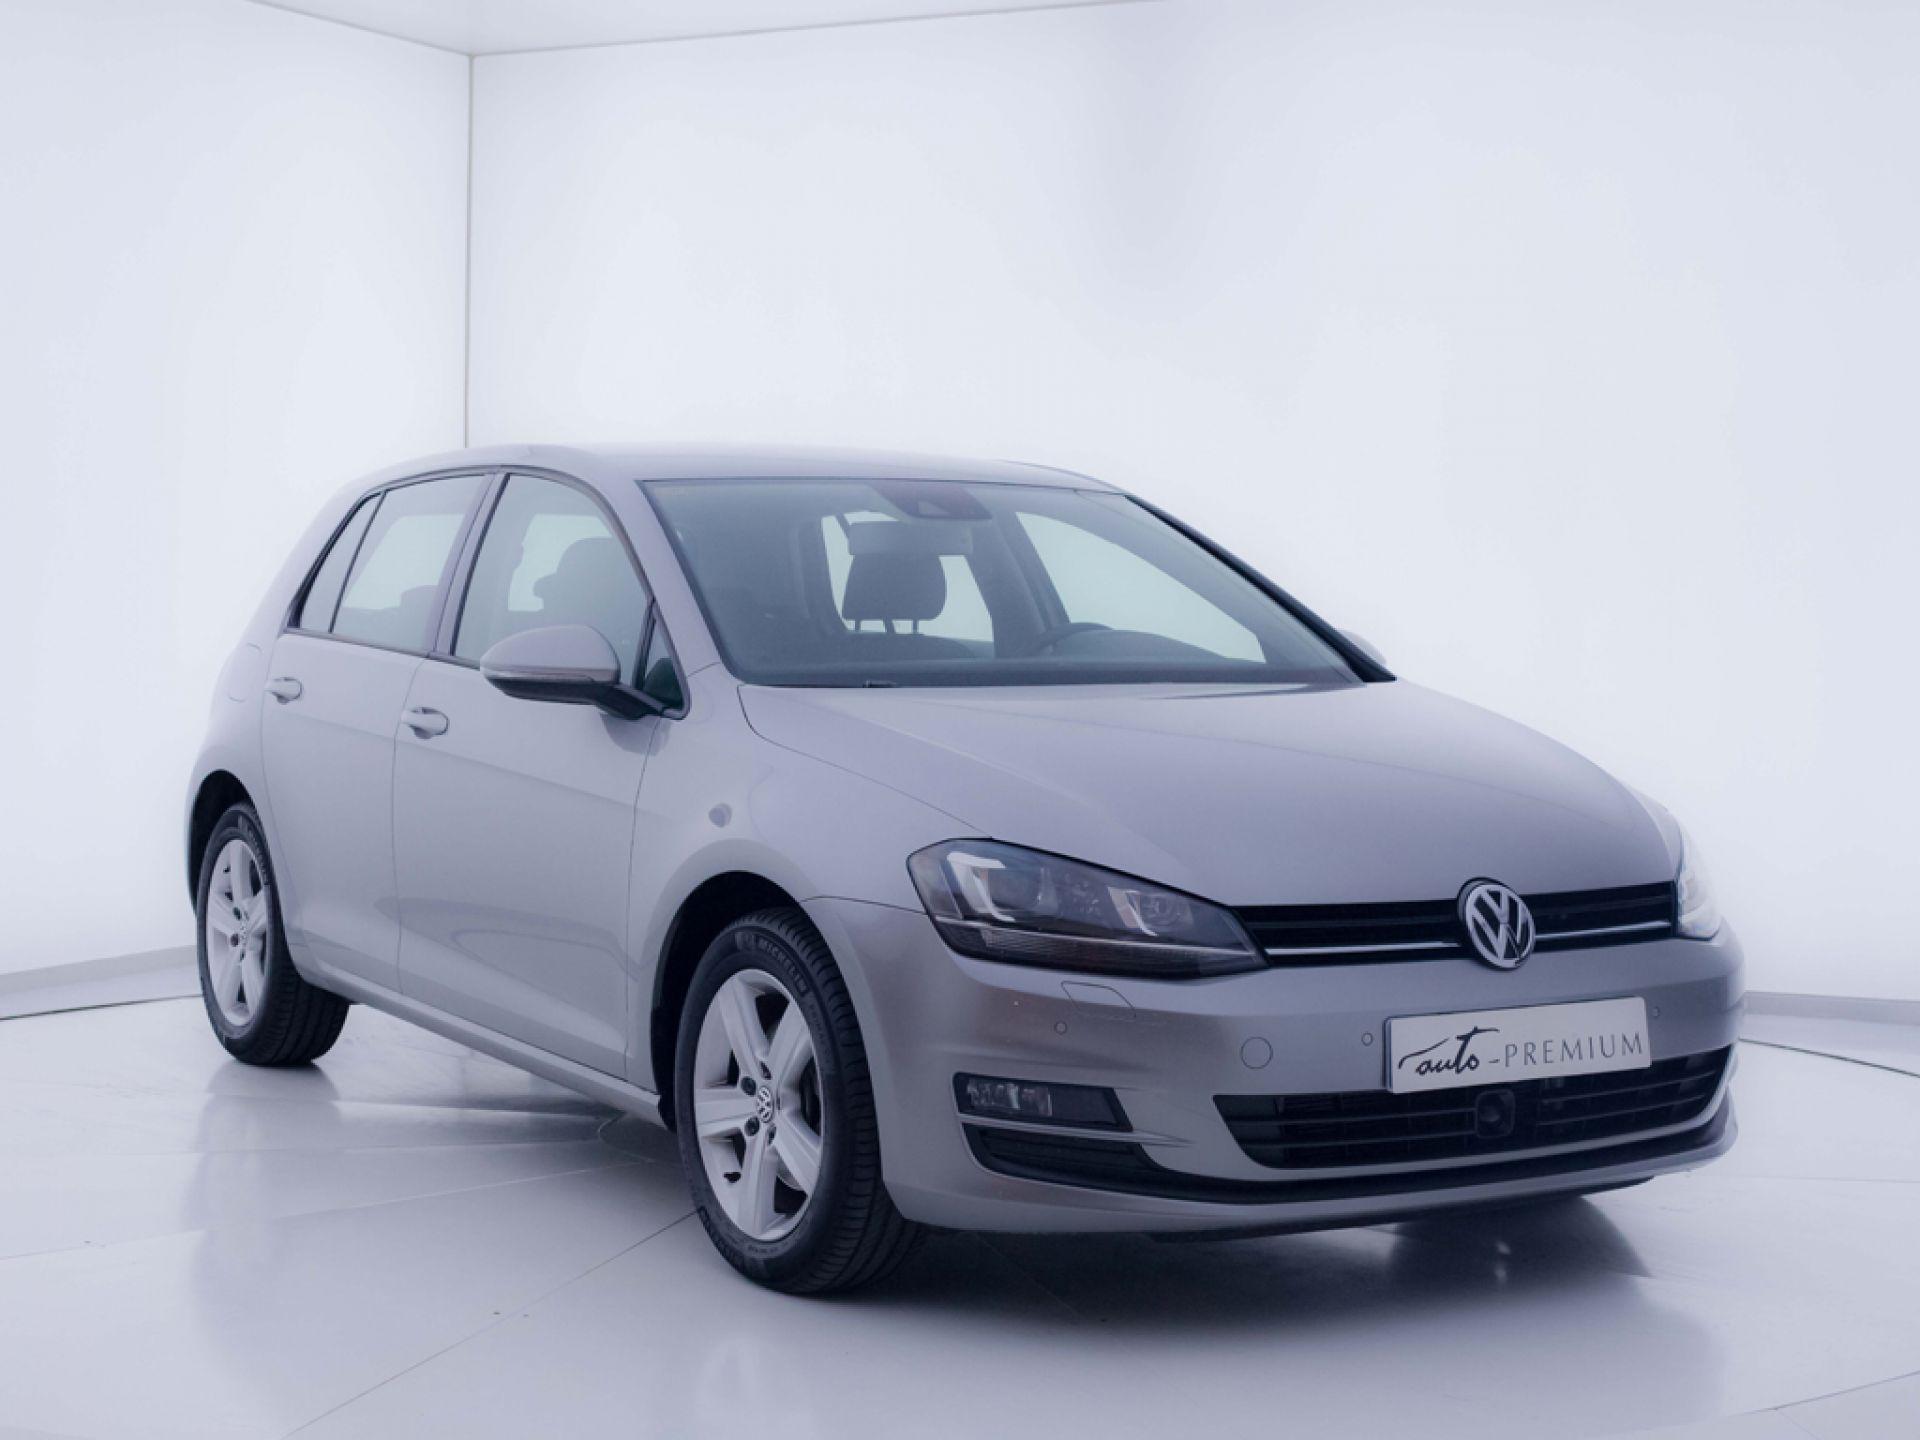 Volkswagen Golf Advance 1.4 TSI 140cv